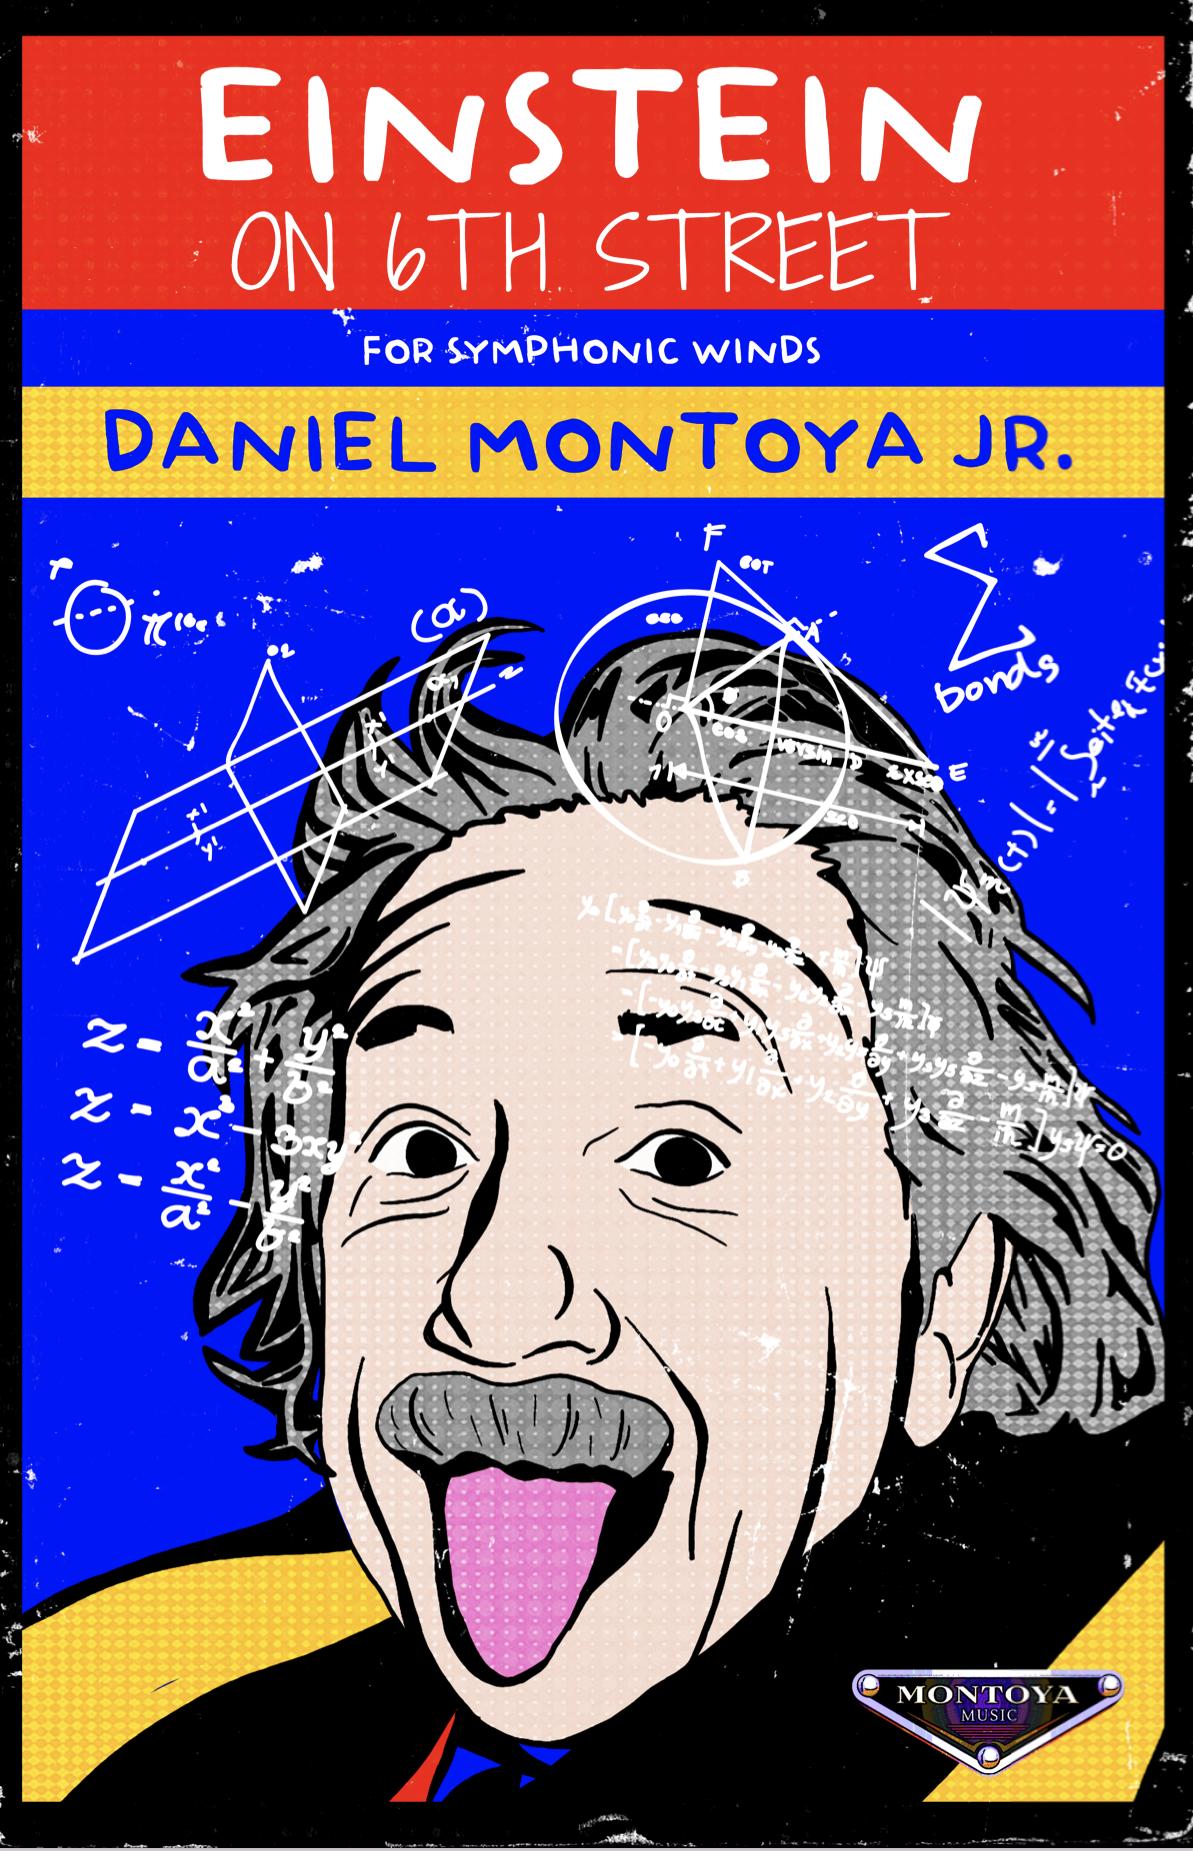 Einstein On 6th Street by Daniel Montoya Jr.